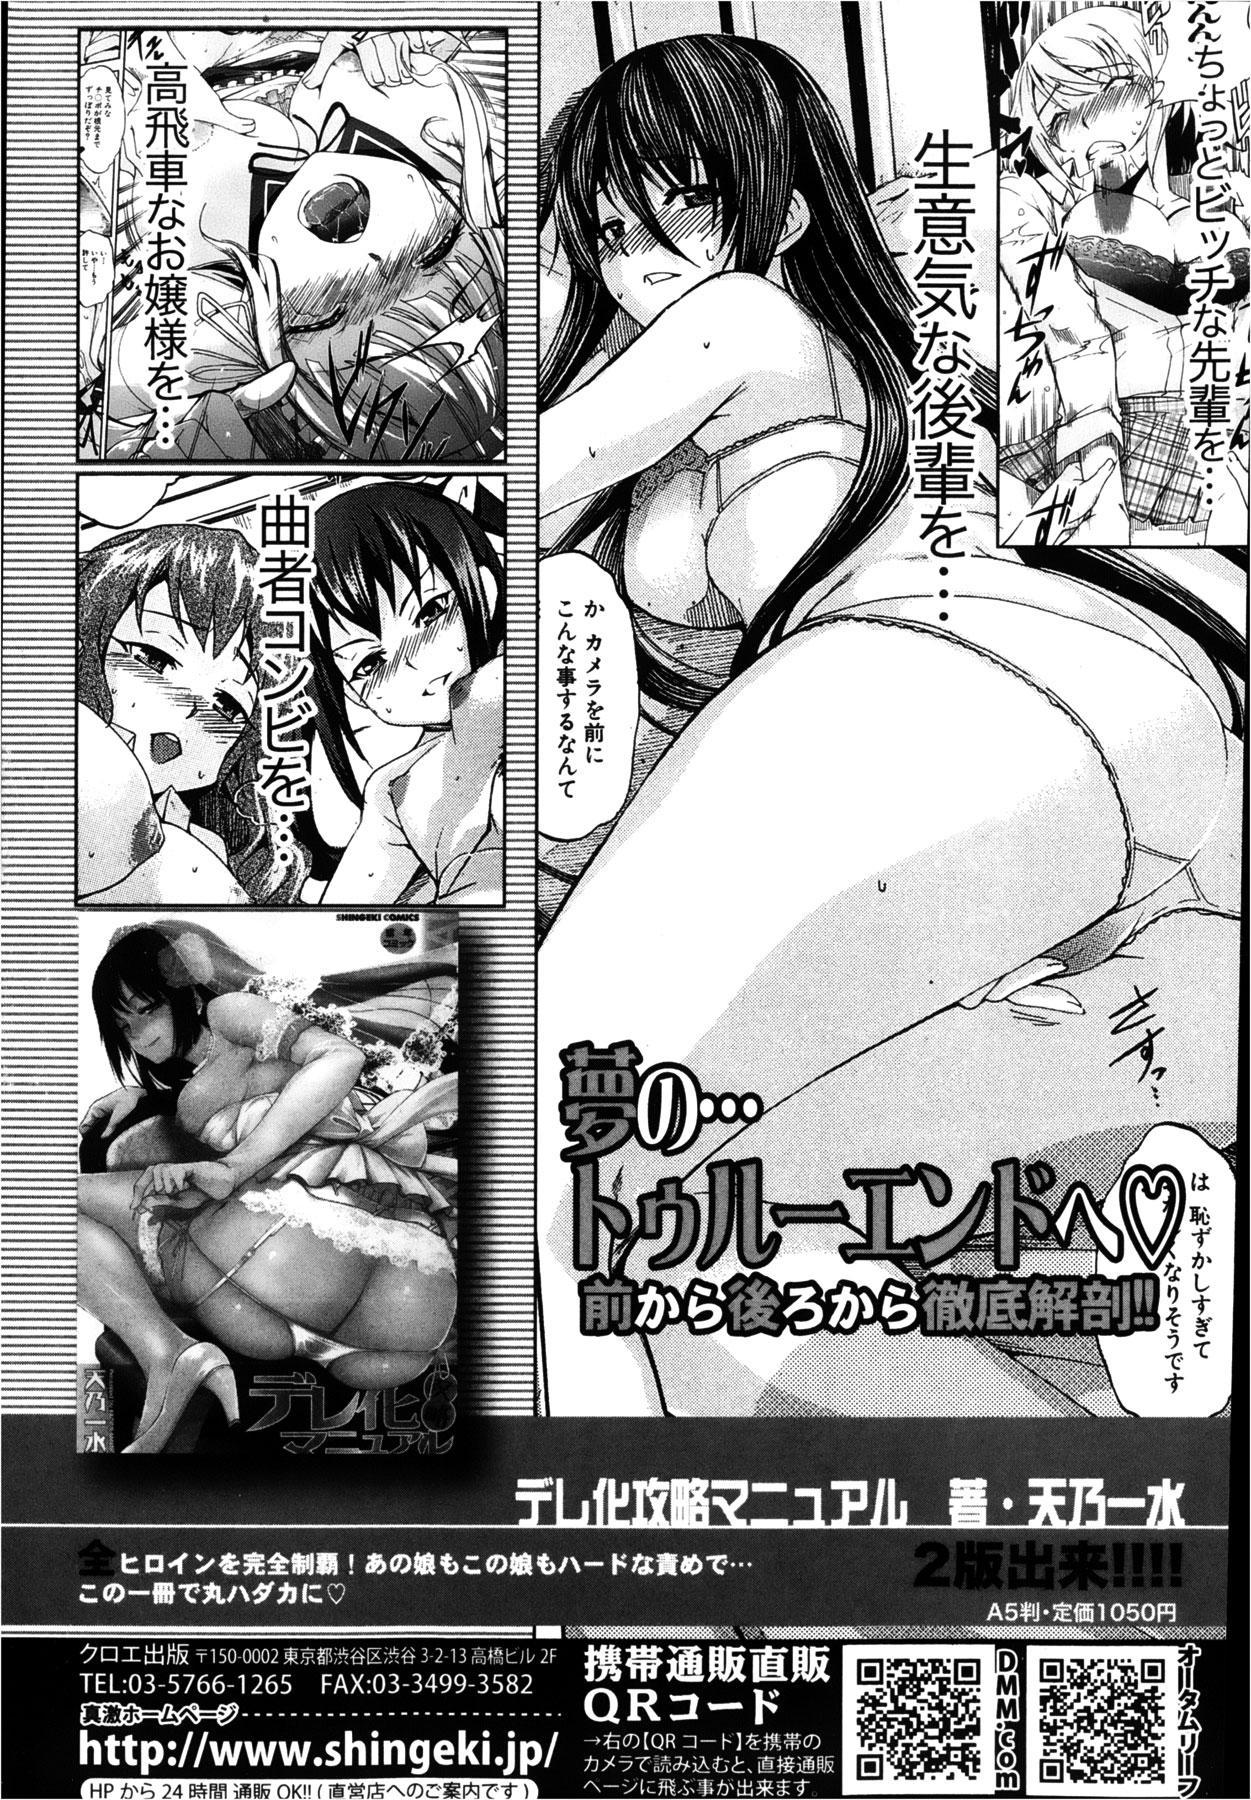 COMIC Shingeki 2013-02 144